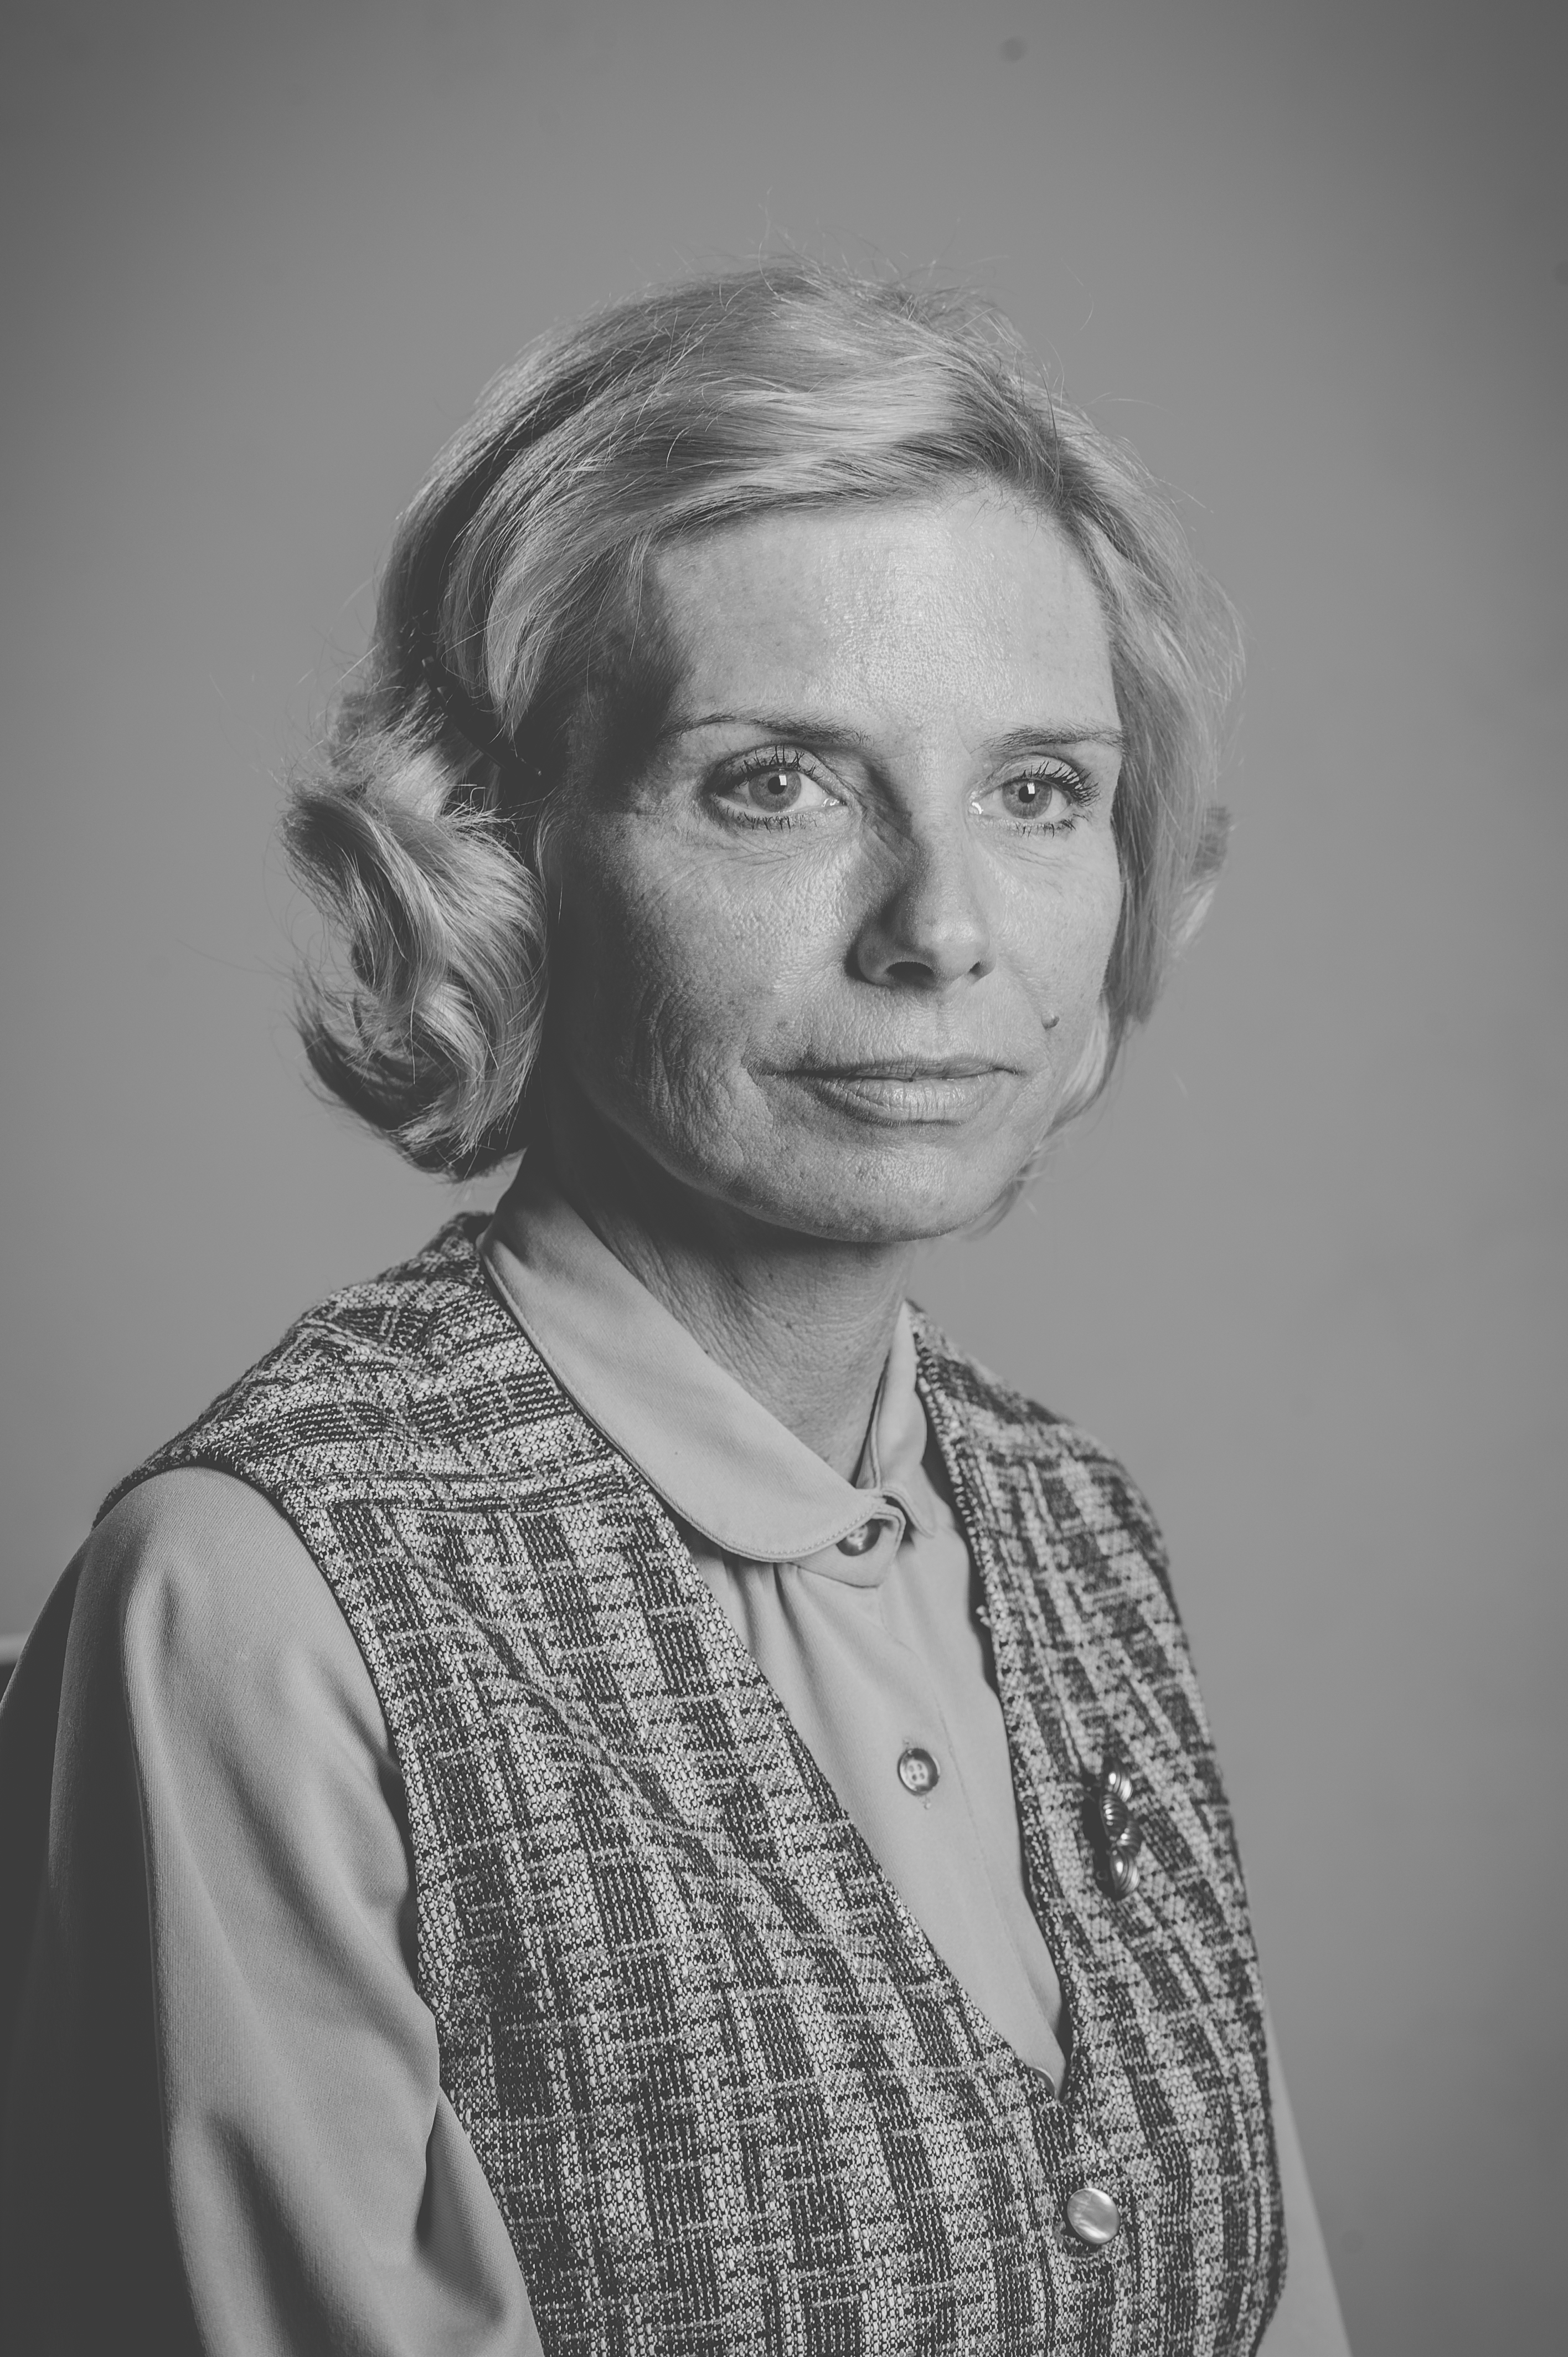 Oma Wetzel